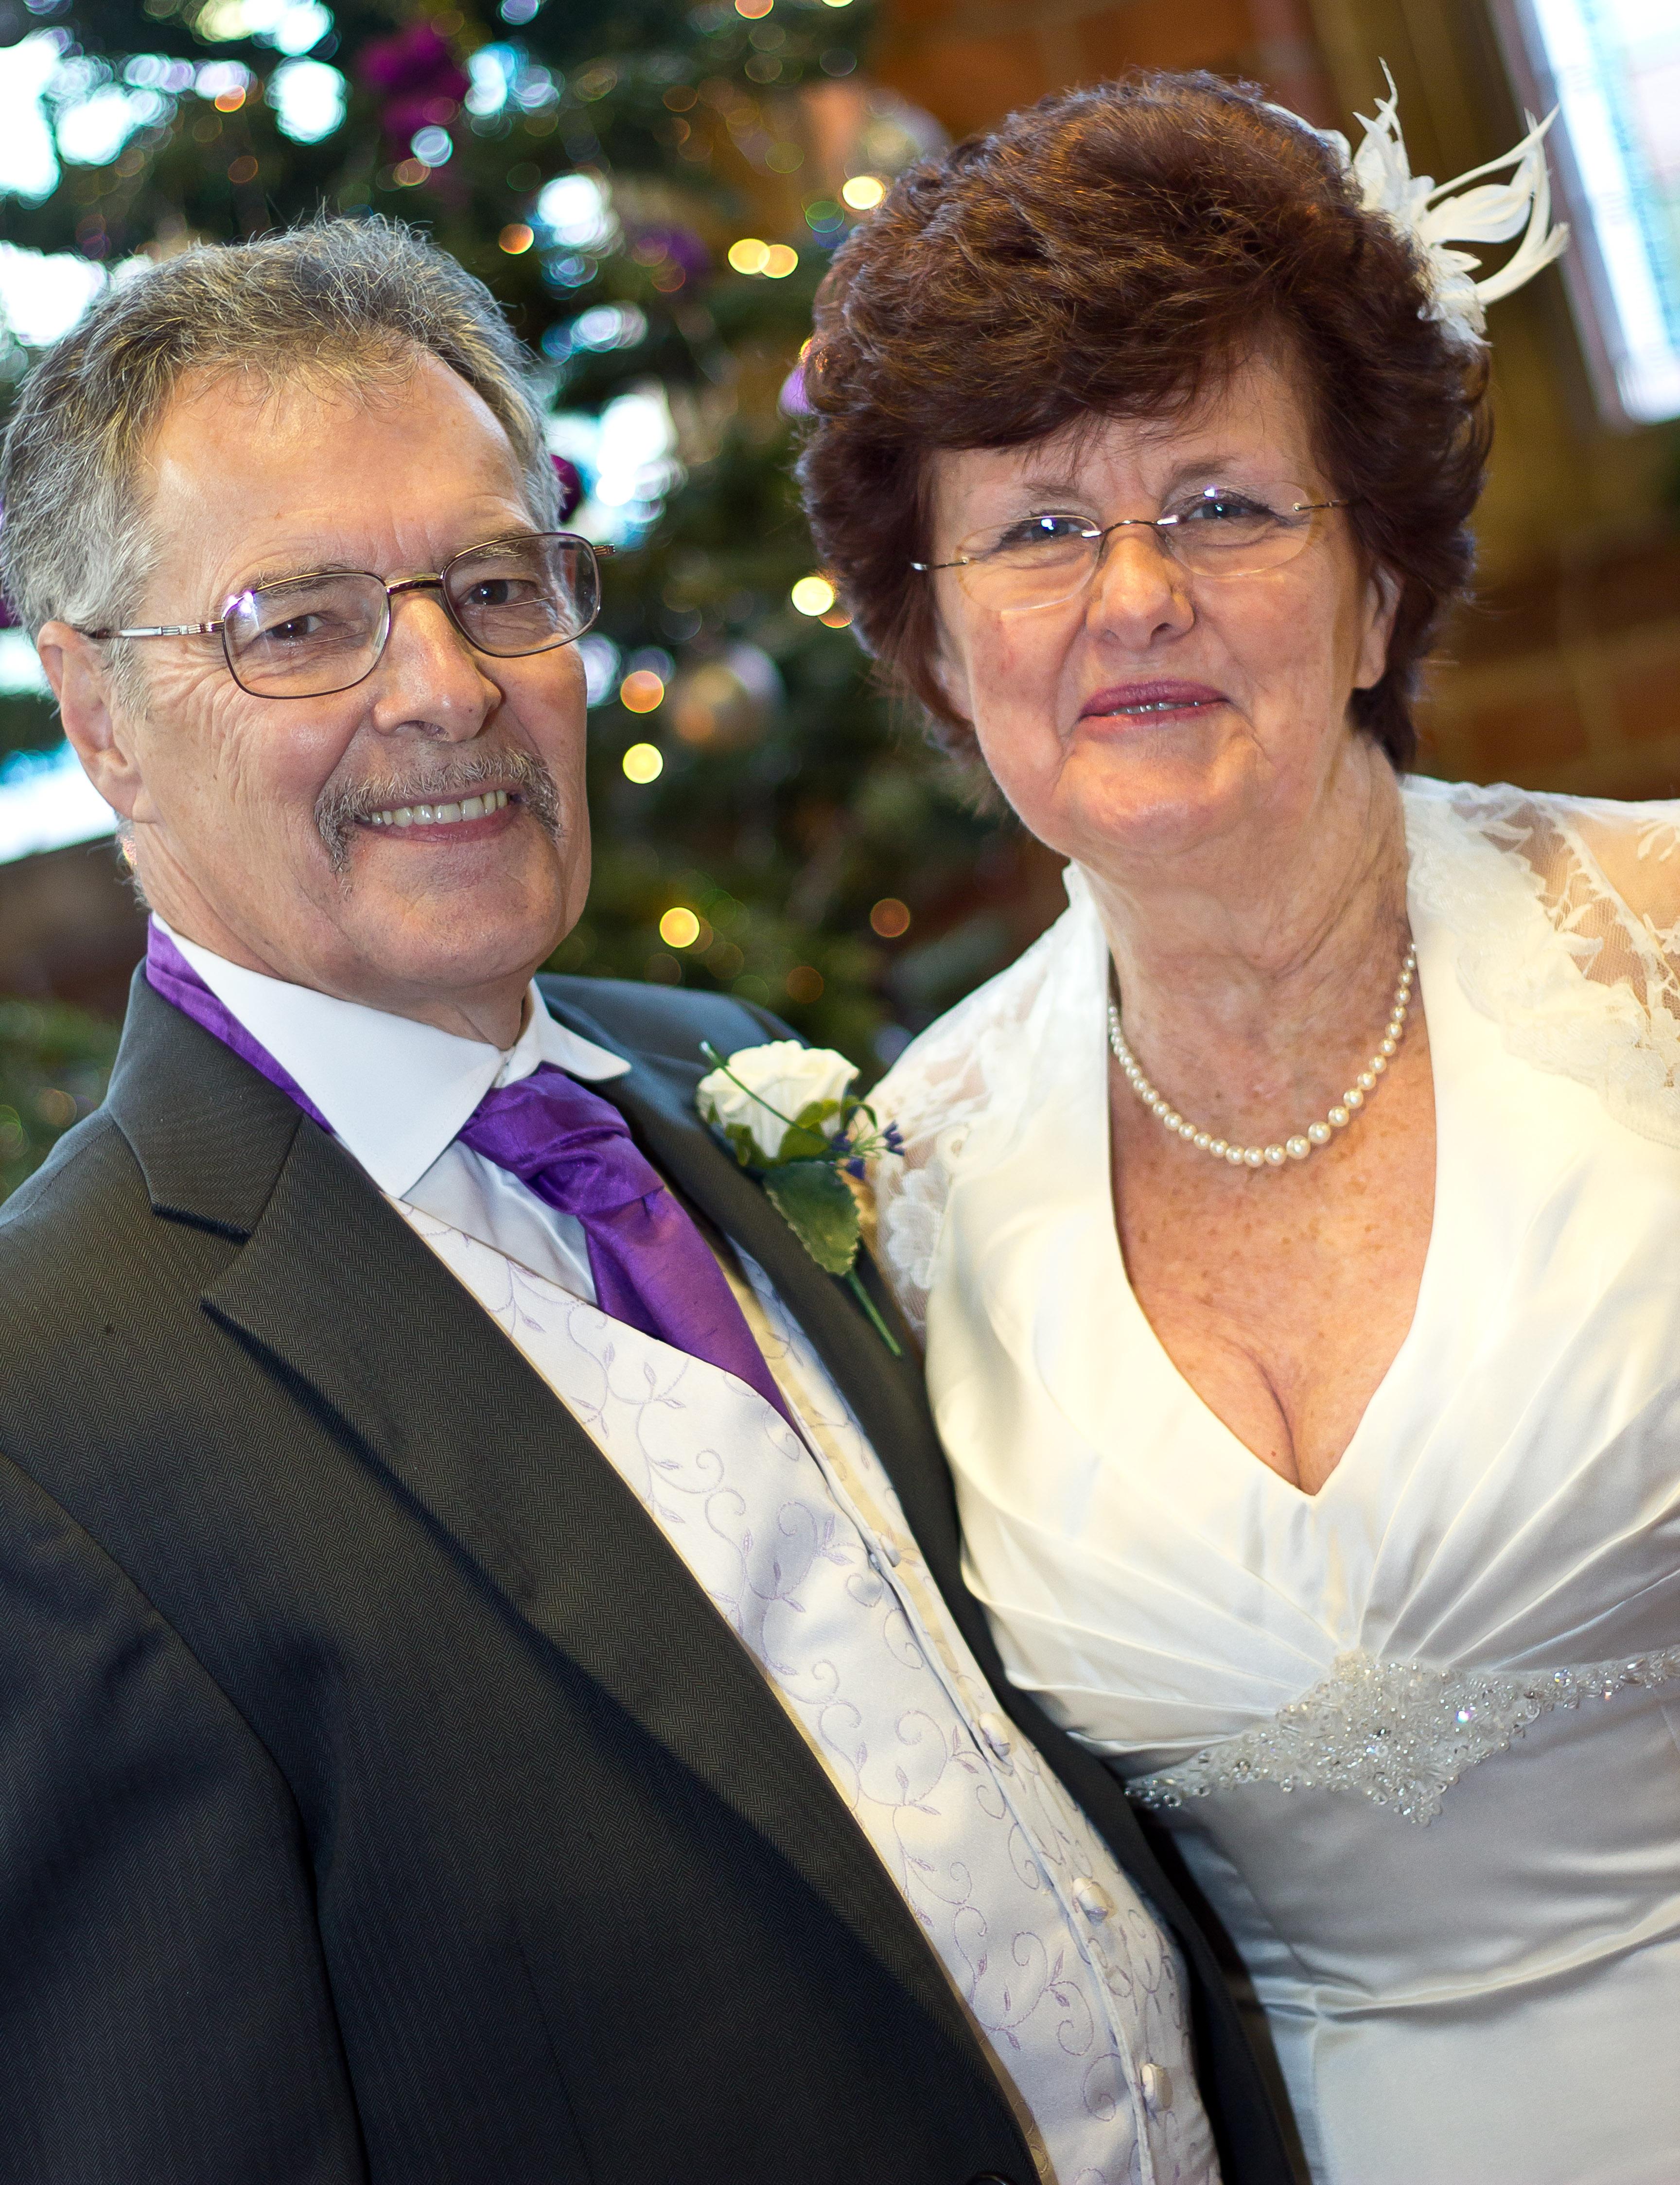 Wedding 2 (4 of 12).jpg